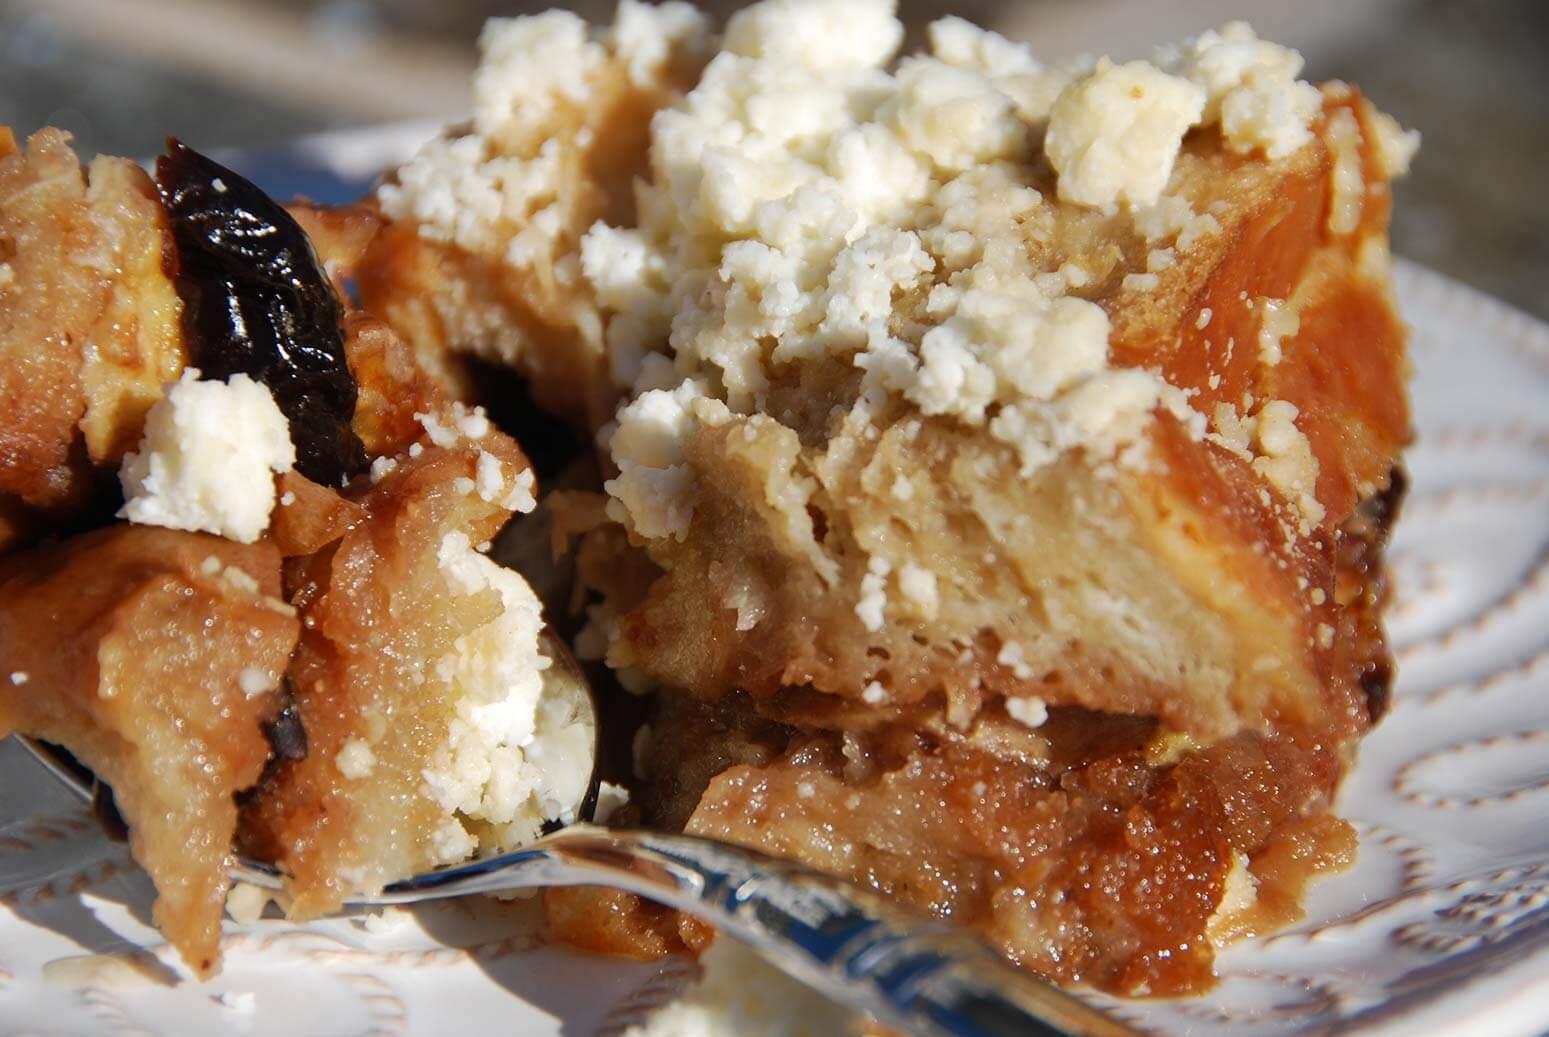 Pati Jinich capirotada or bread pudding recipe